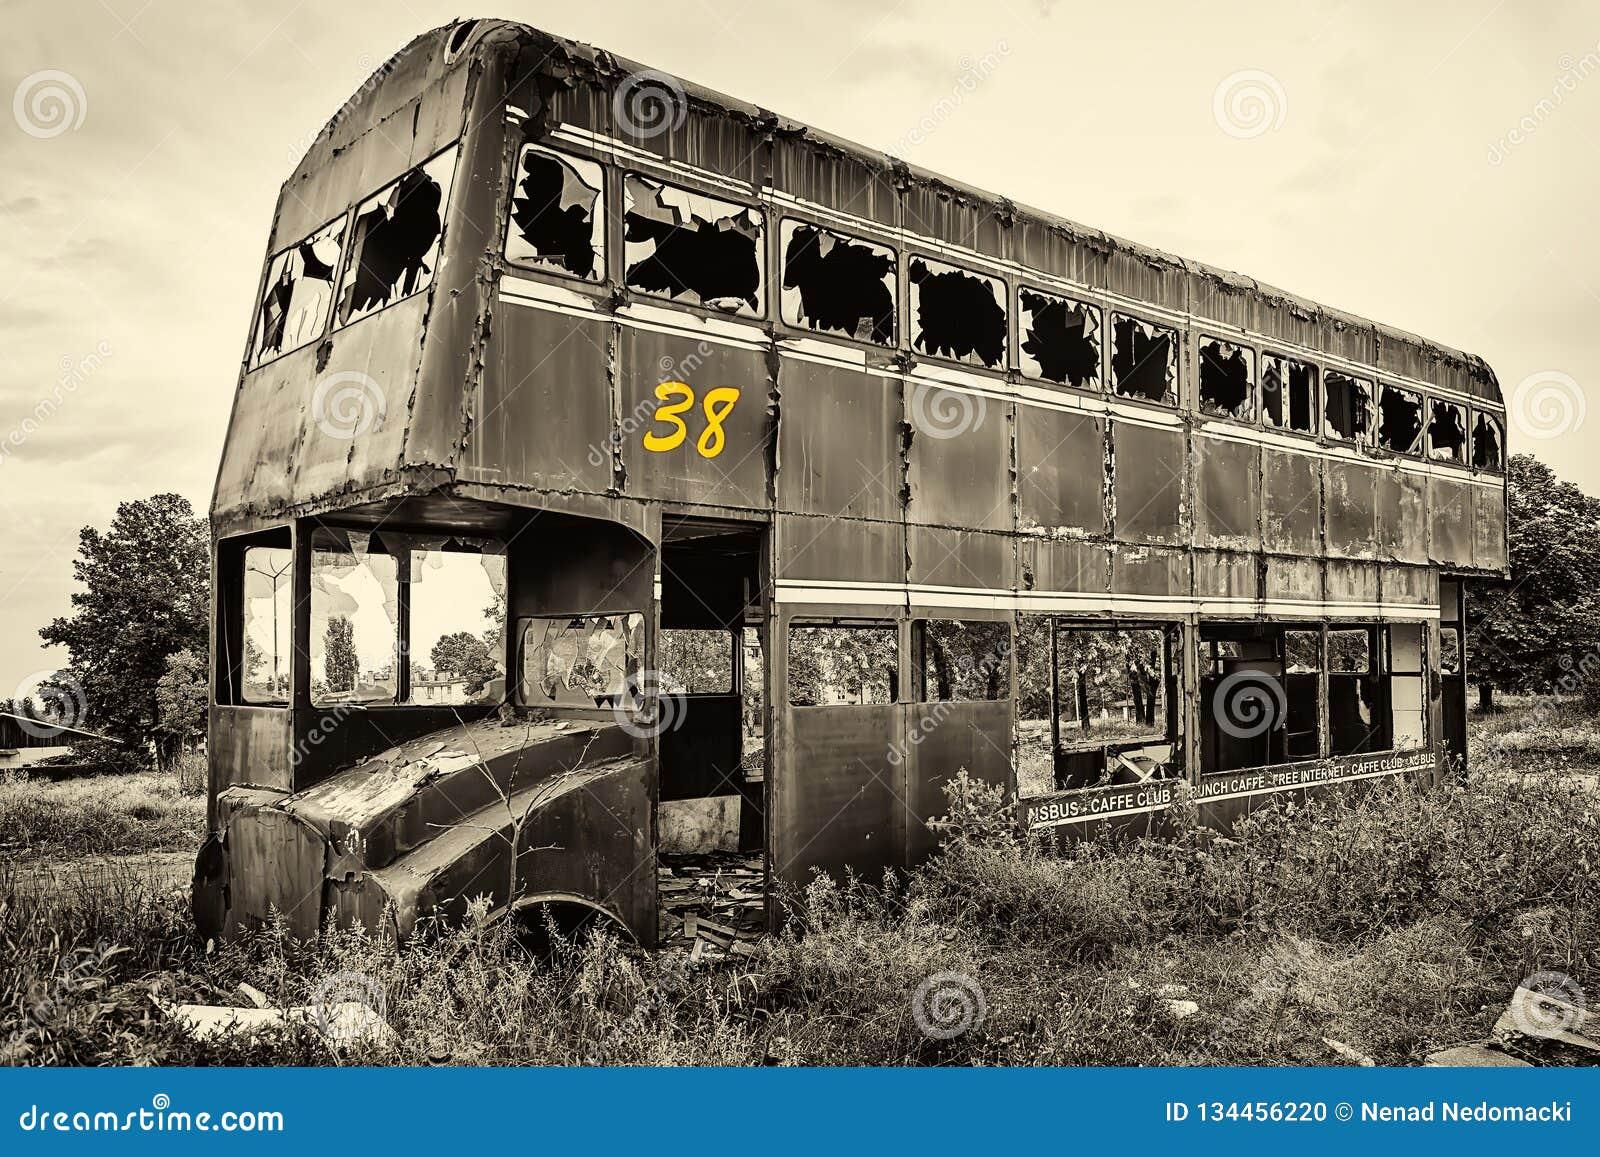 Rusty Abandoned Double-Decker Bus